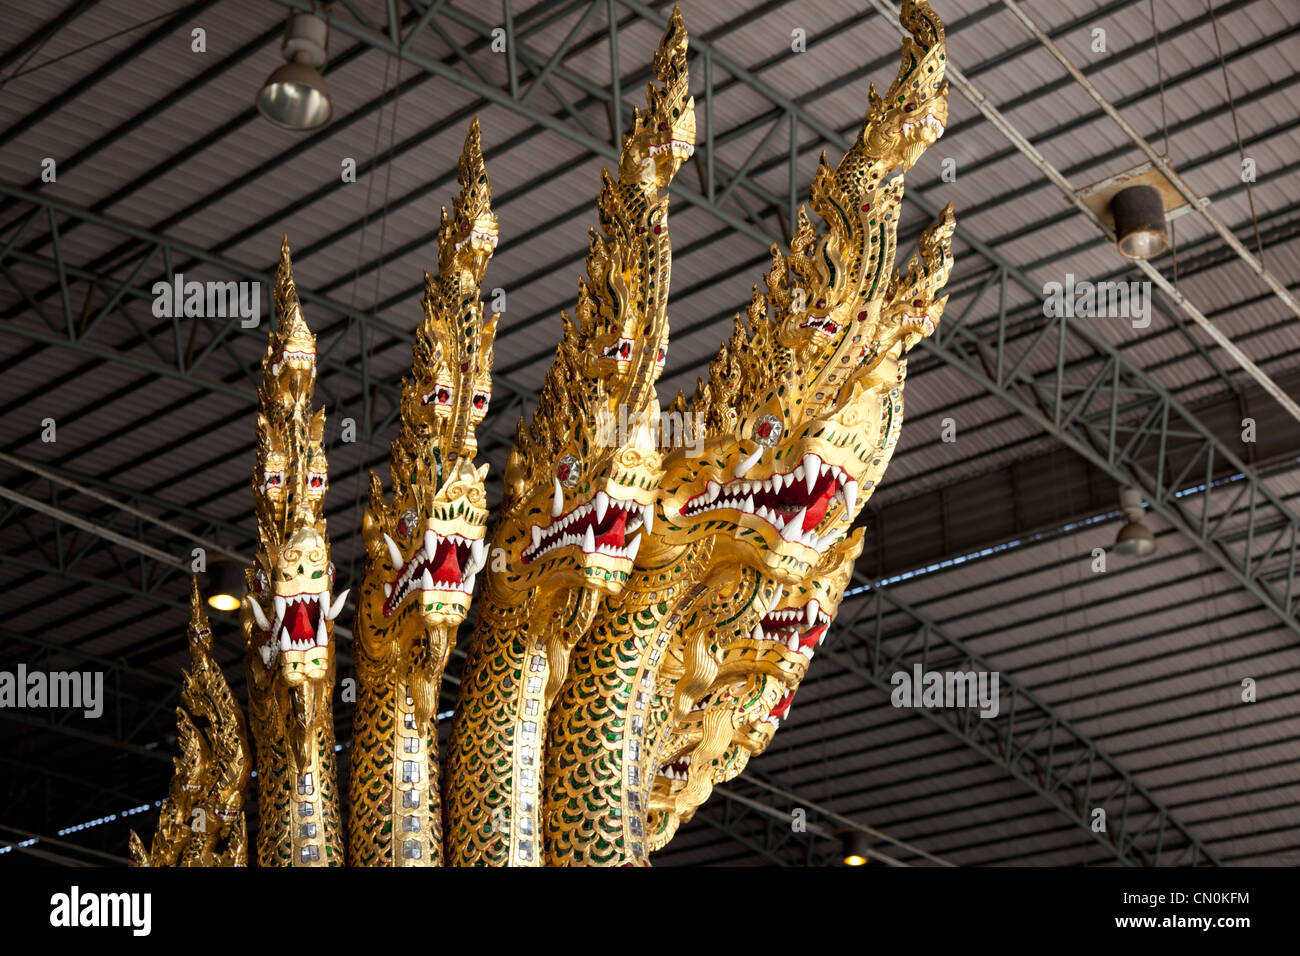 In the National Museum of Royal Barges, snake-like figurehead (Thonburi - Bangkok - Thailand) Figure de proue de - Stock Image